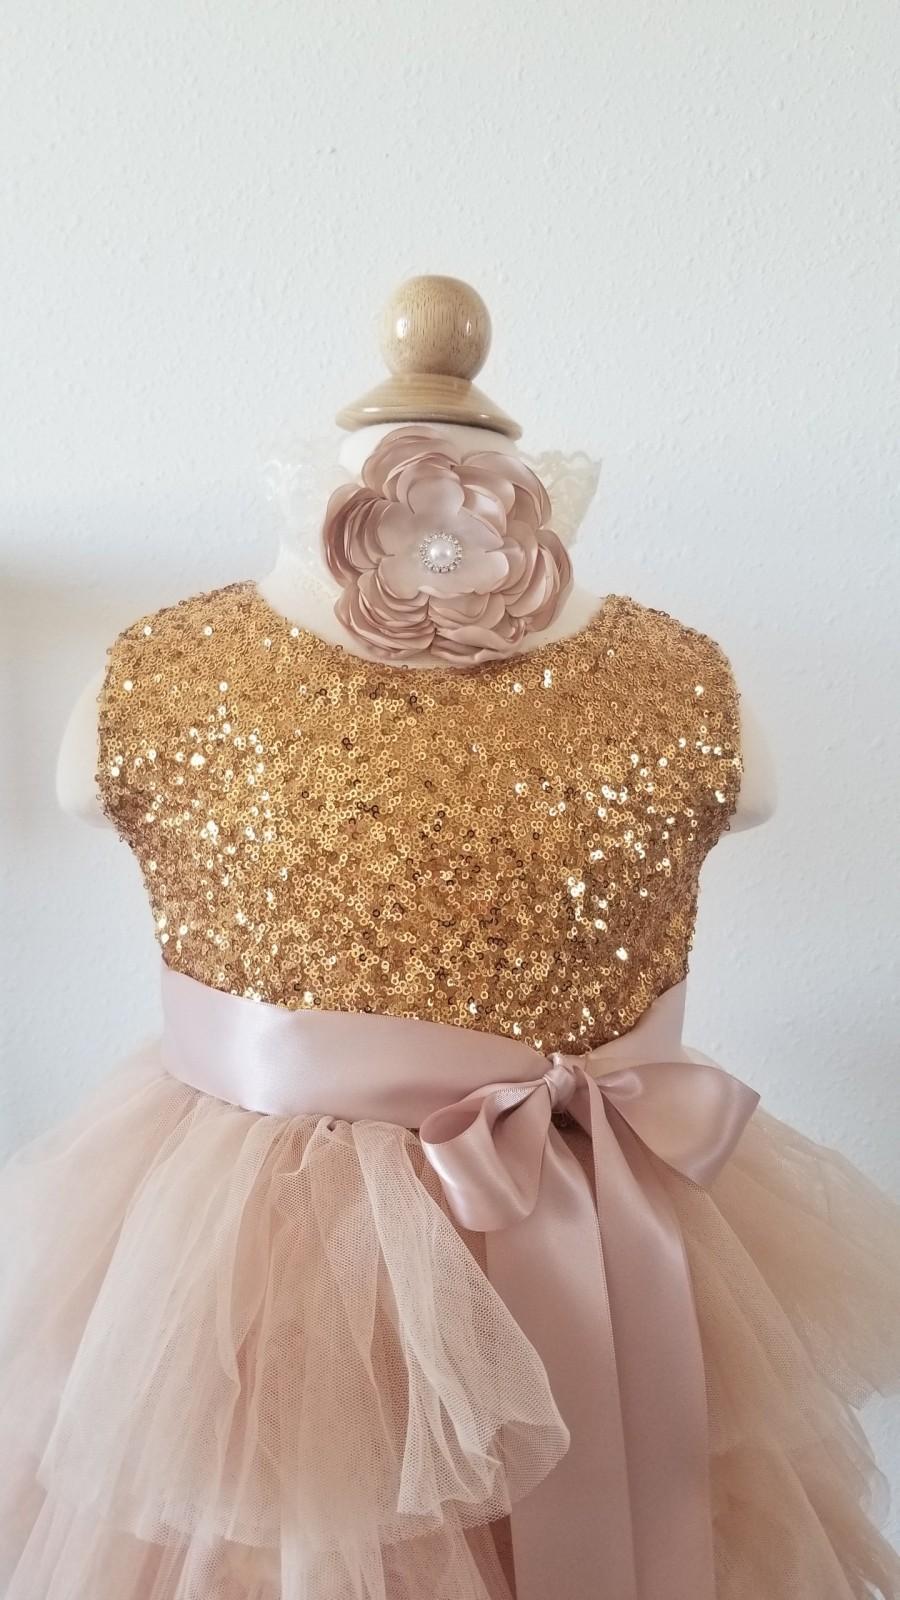 Hochzeit - Gold Sequin Flower Girl Dress Tutu Dress Birthday Dress Girls Party Dress Tulle Dress Sweetheart Back